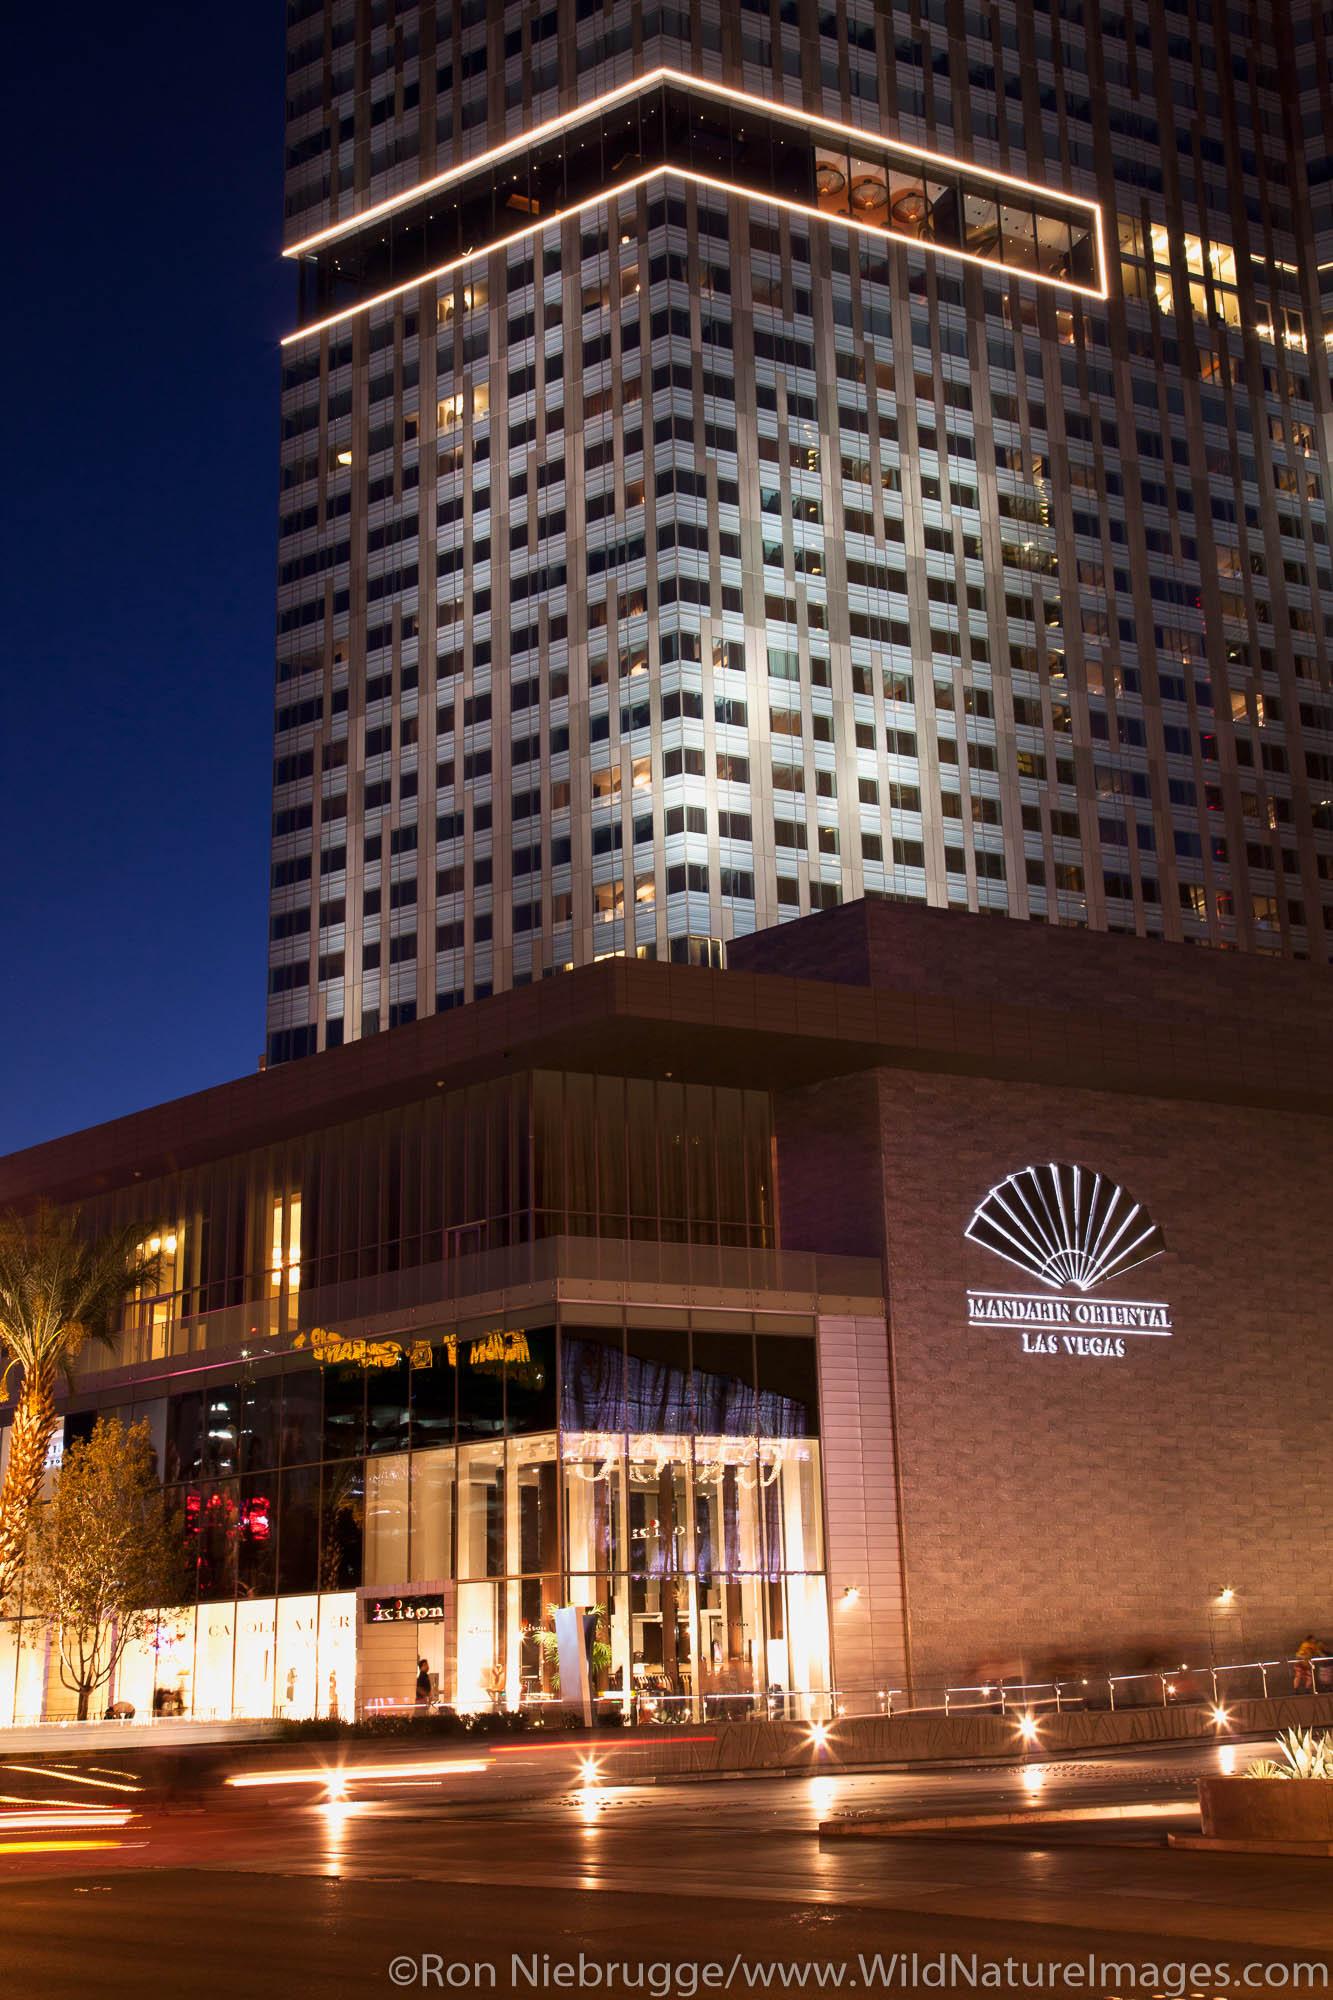 Mandarin Oriental at CityCenter, Las Vegas, NV